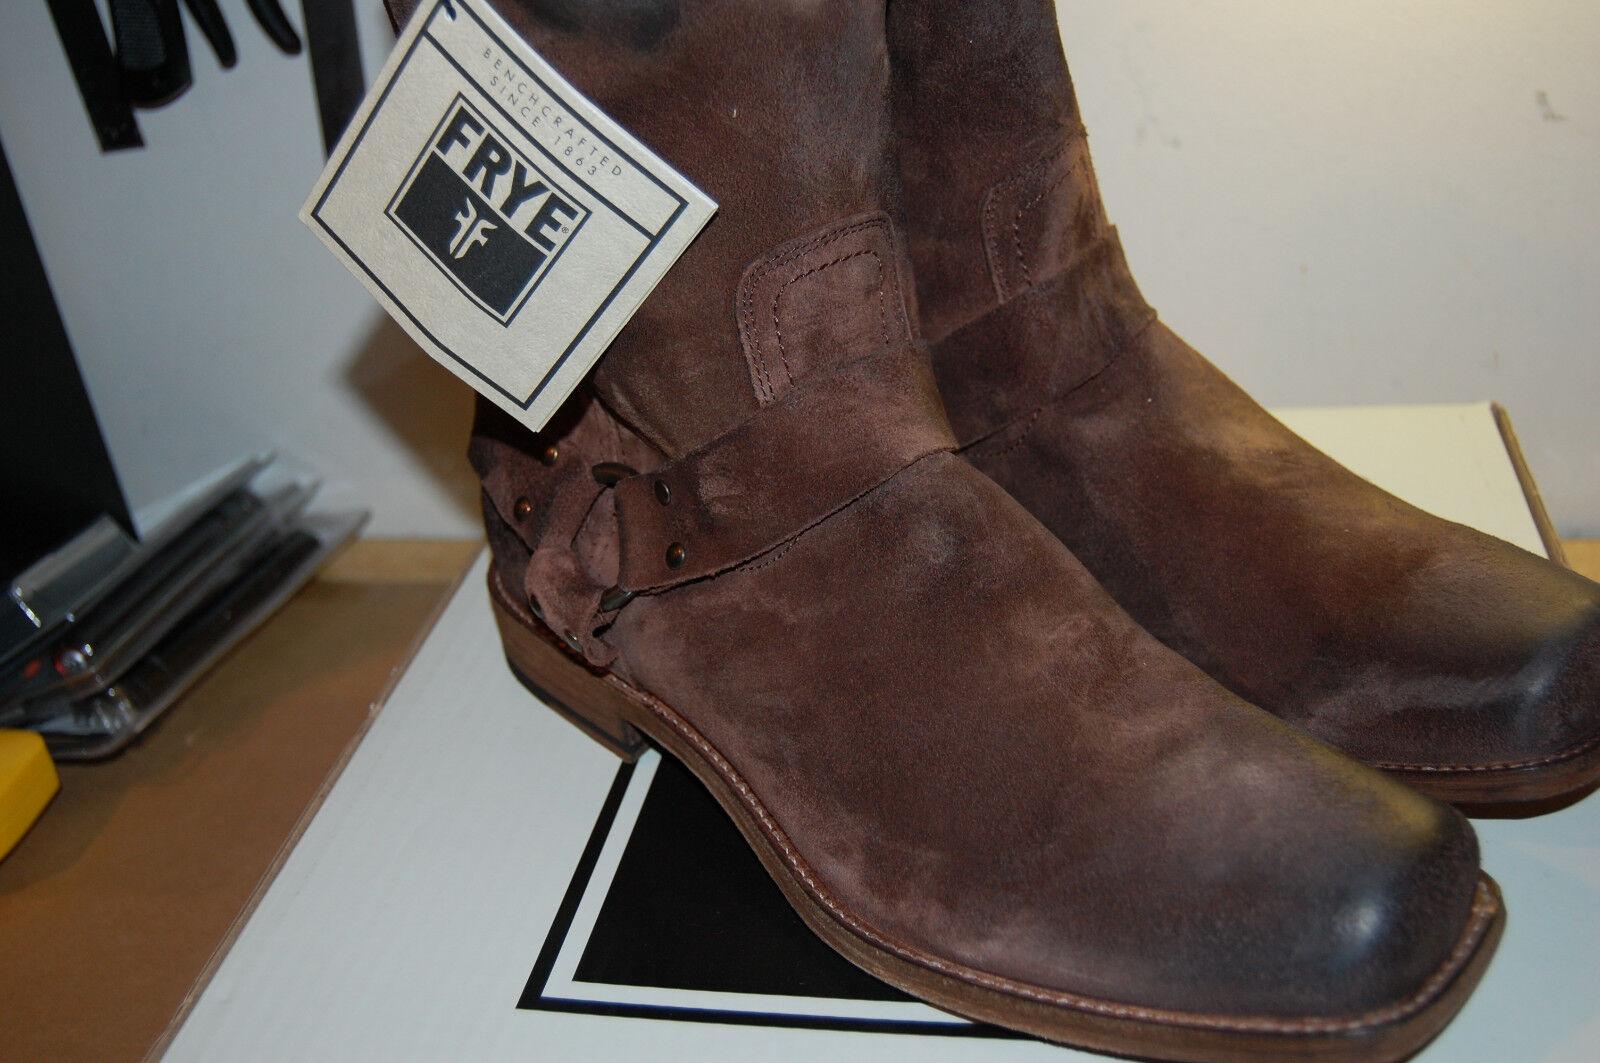 NIB Frye Frye Frye Smith Harness stivali antique leather finish leather lined Dimensione11.5   298 c9a279